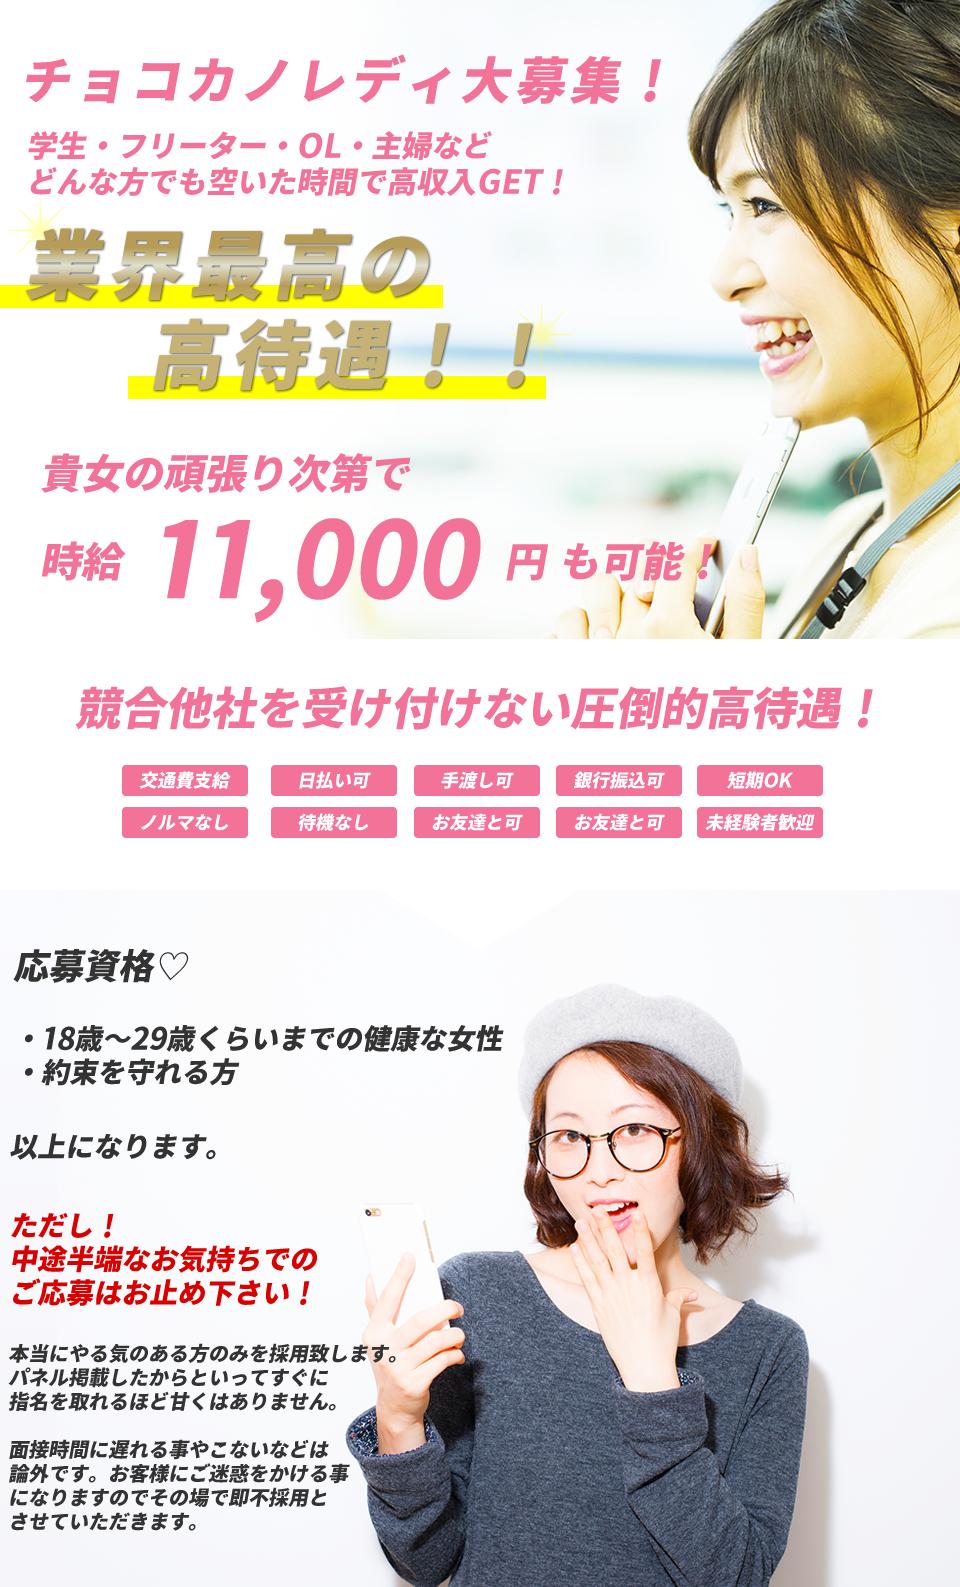 http://choko-kano.com/recruit/img/main.png